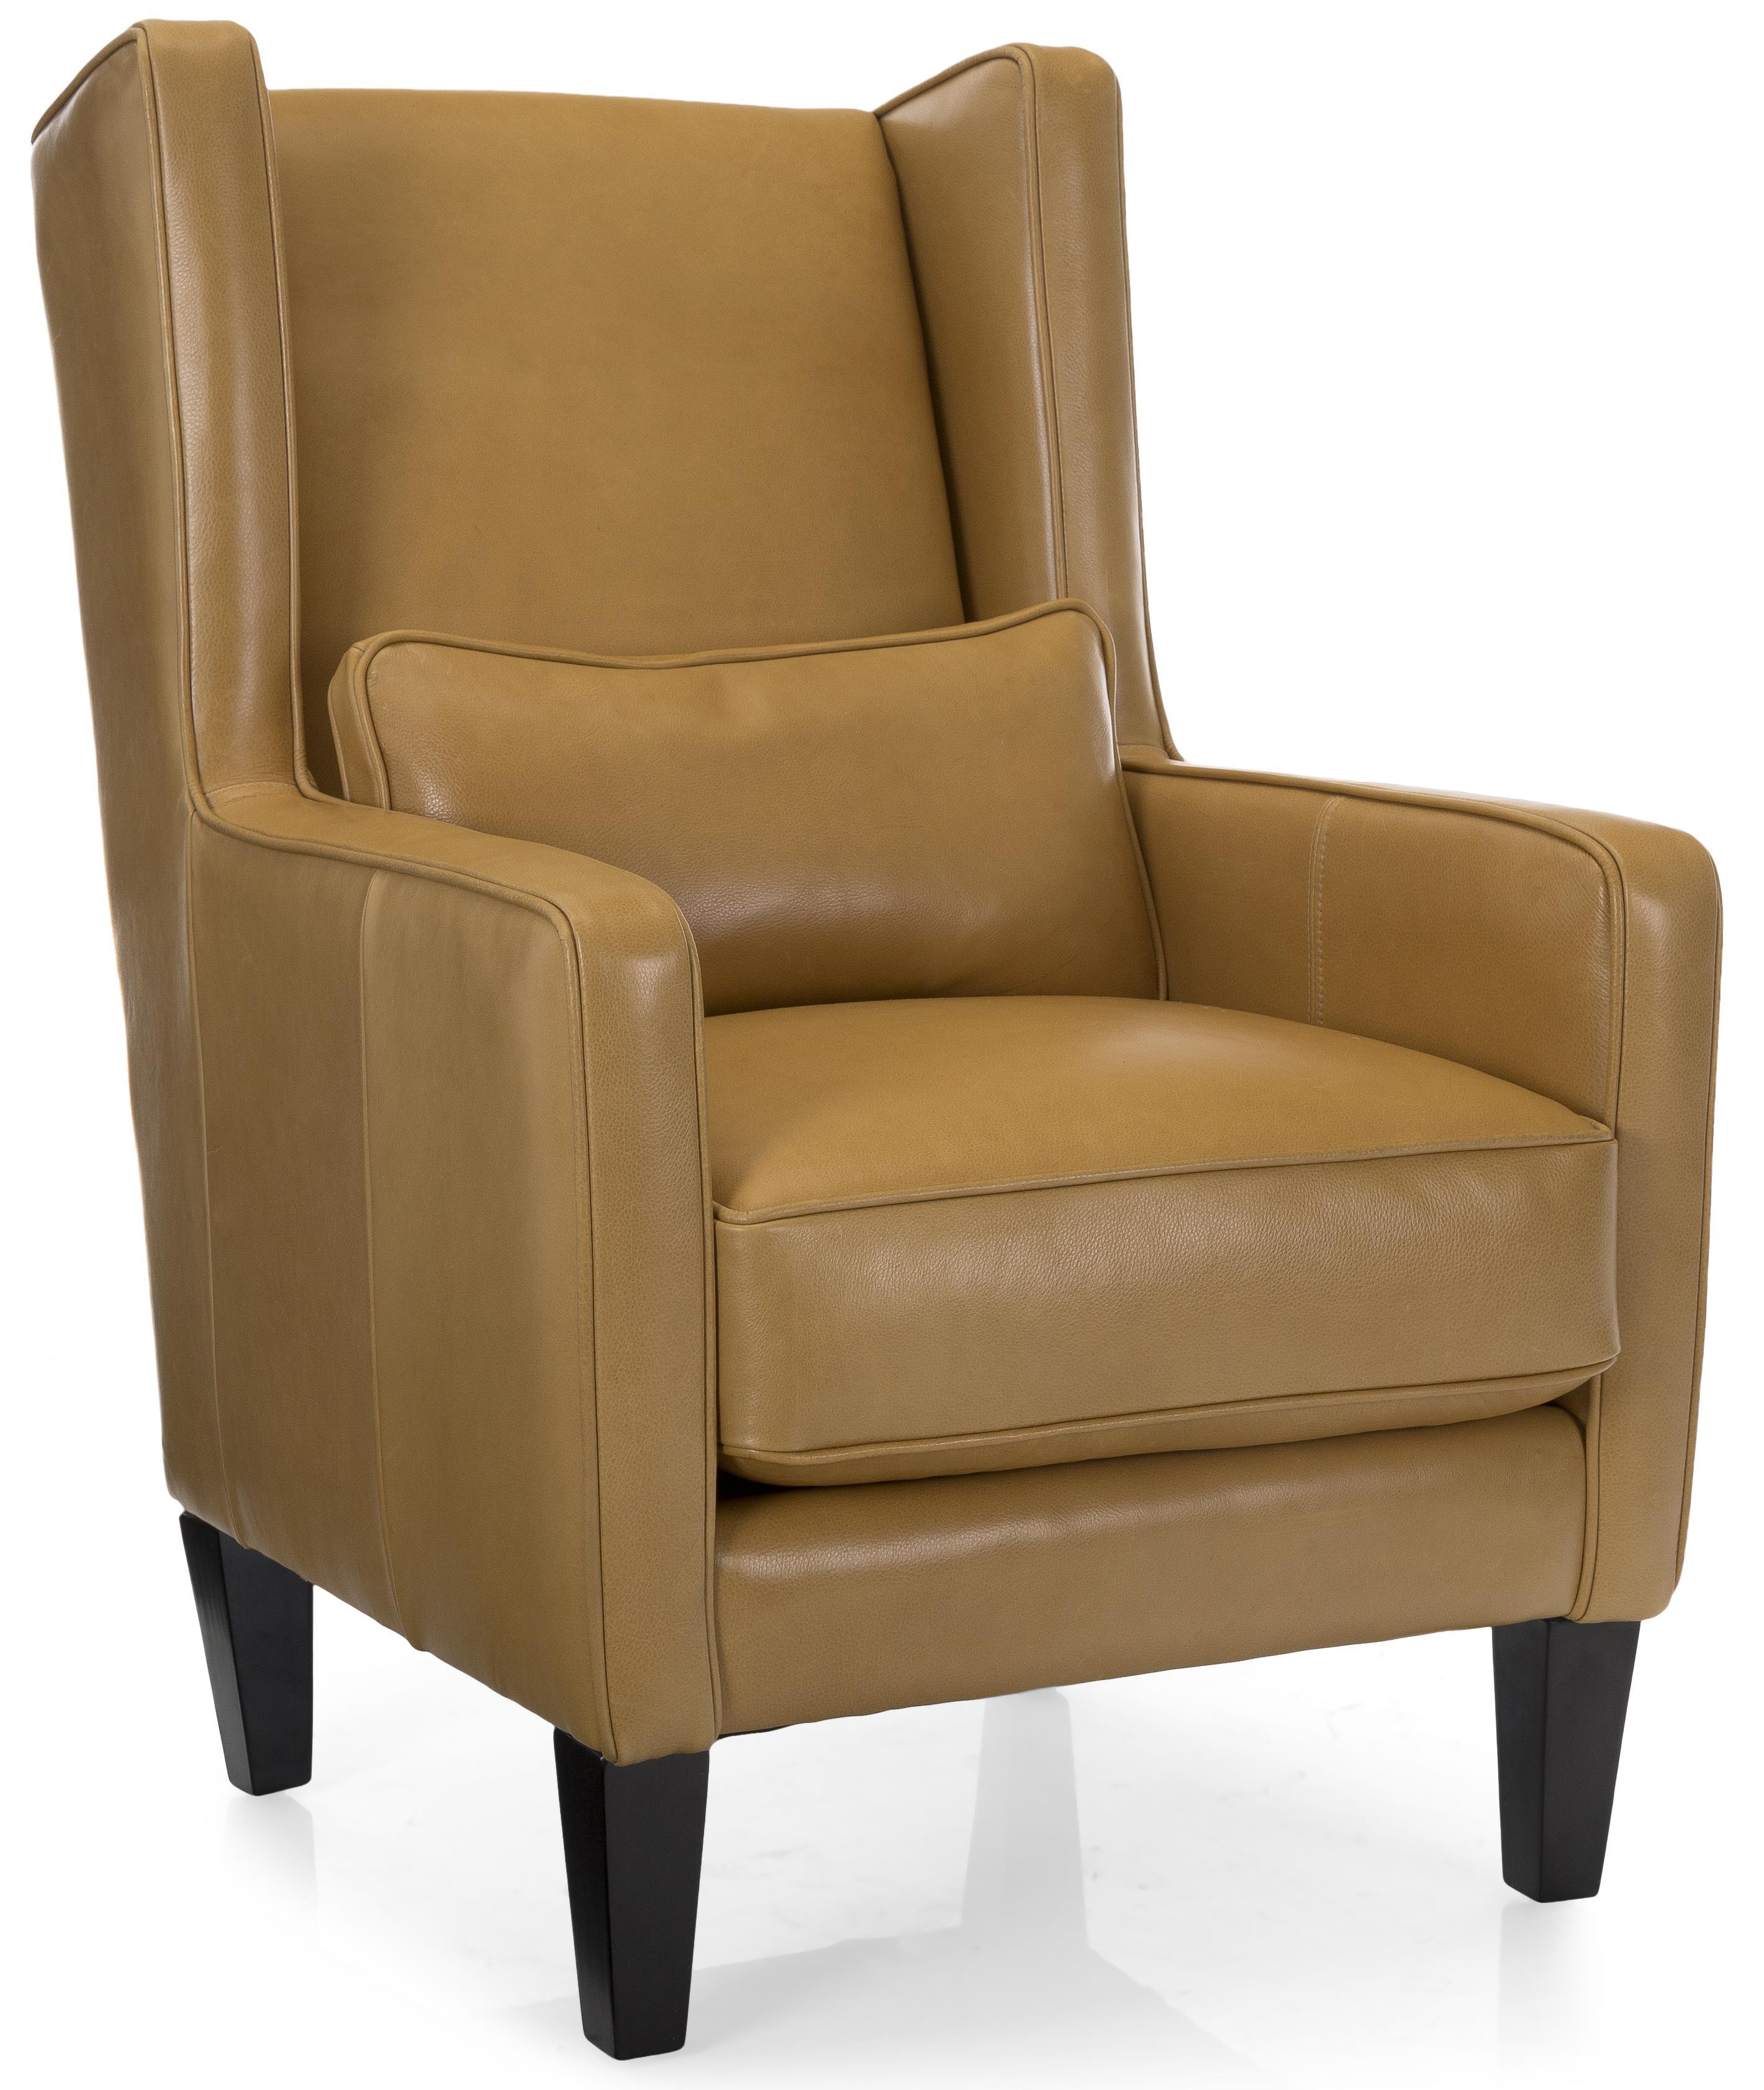 taelor designs 7328 upholstered chair bennett 39 s home furnishings upholstered chairs. Black Bedroom Furniture Sets. Home Design Ideas